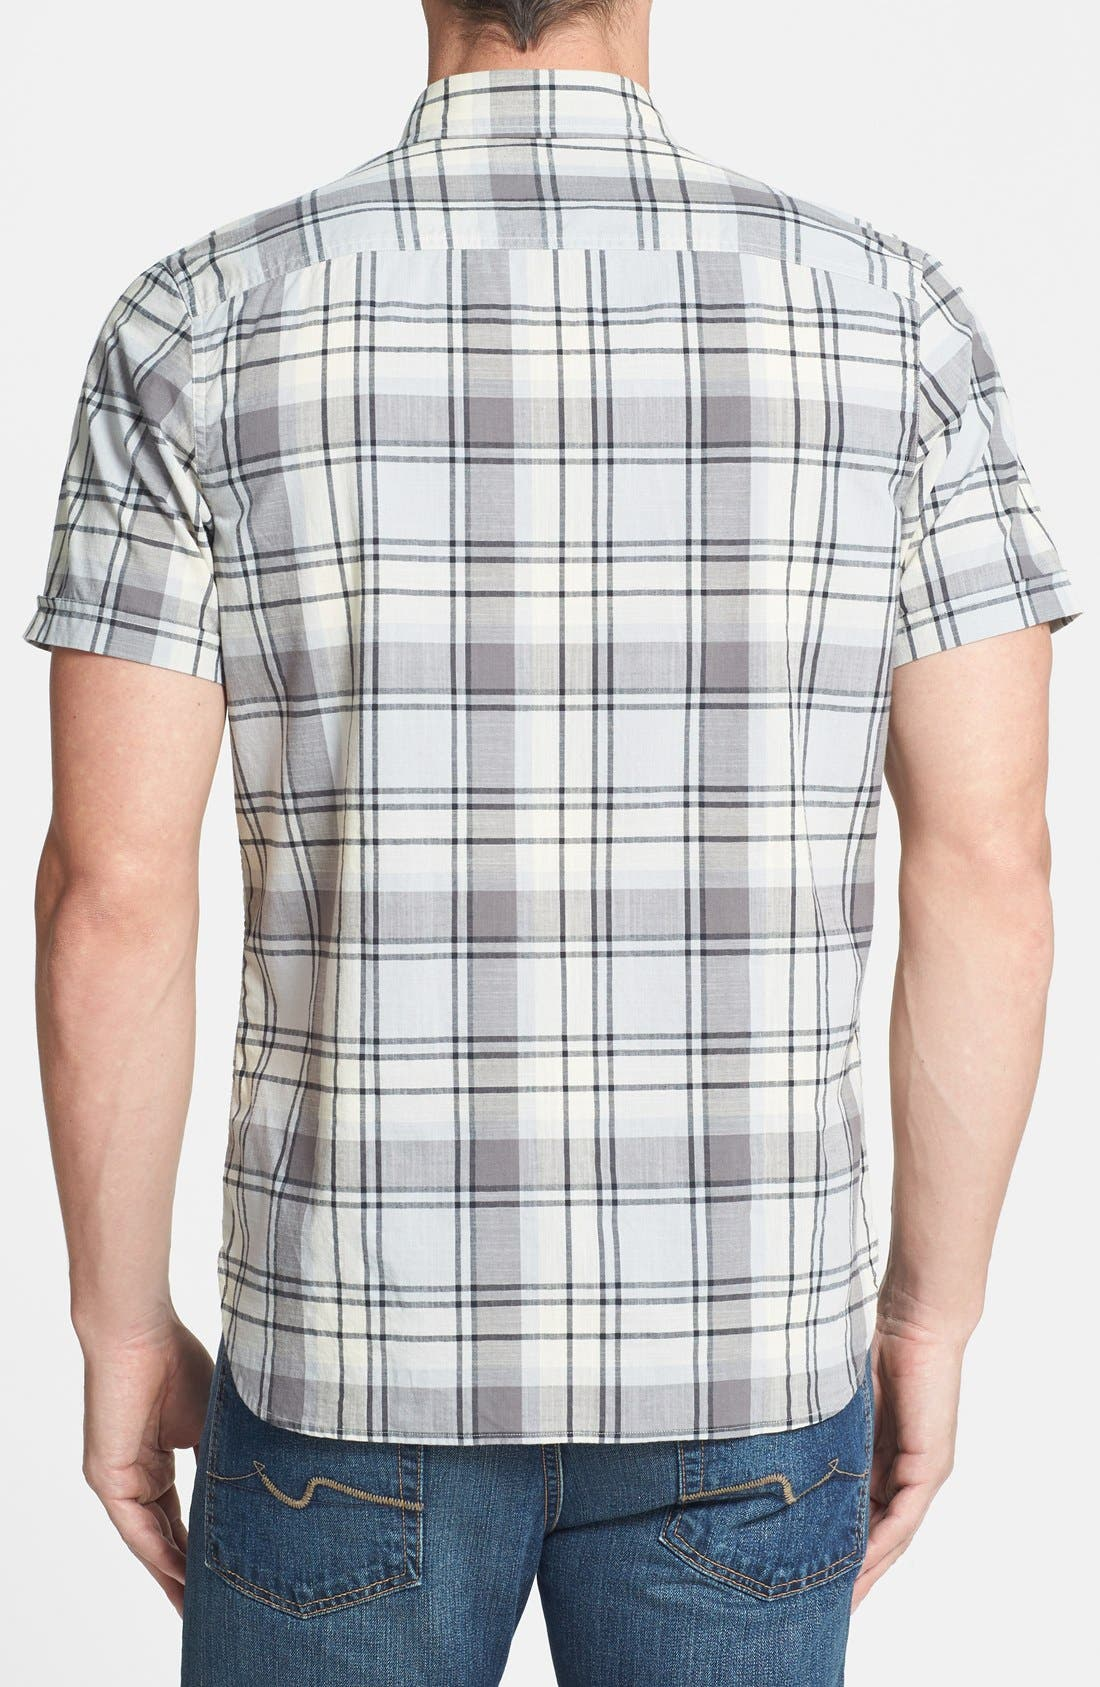 Alternate Image 2  - Wallin & Bros. 'Signature' Trim Fit Sport Shirt